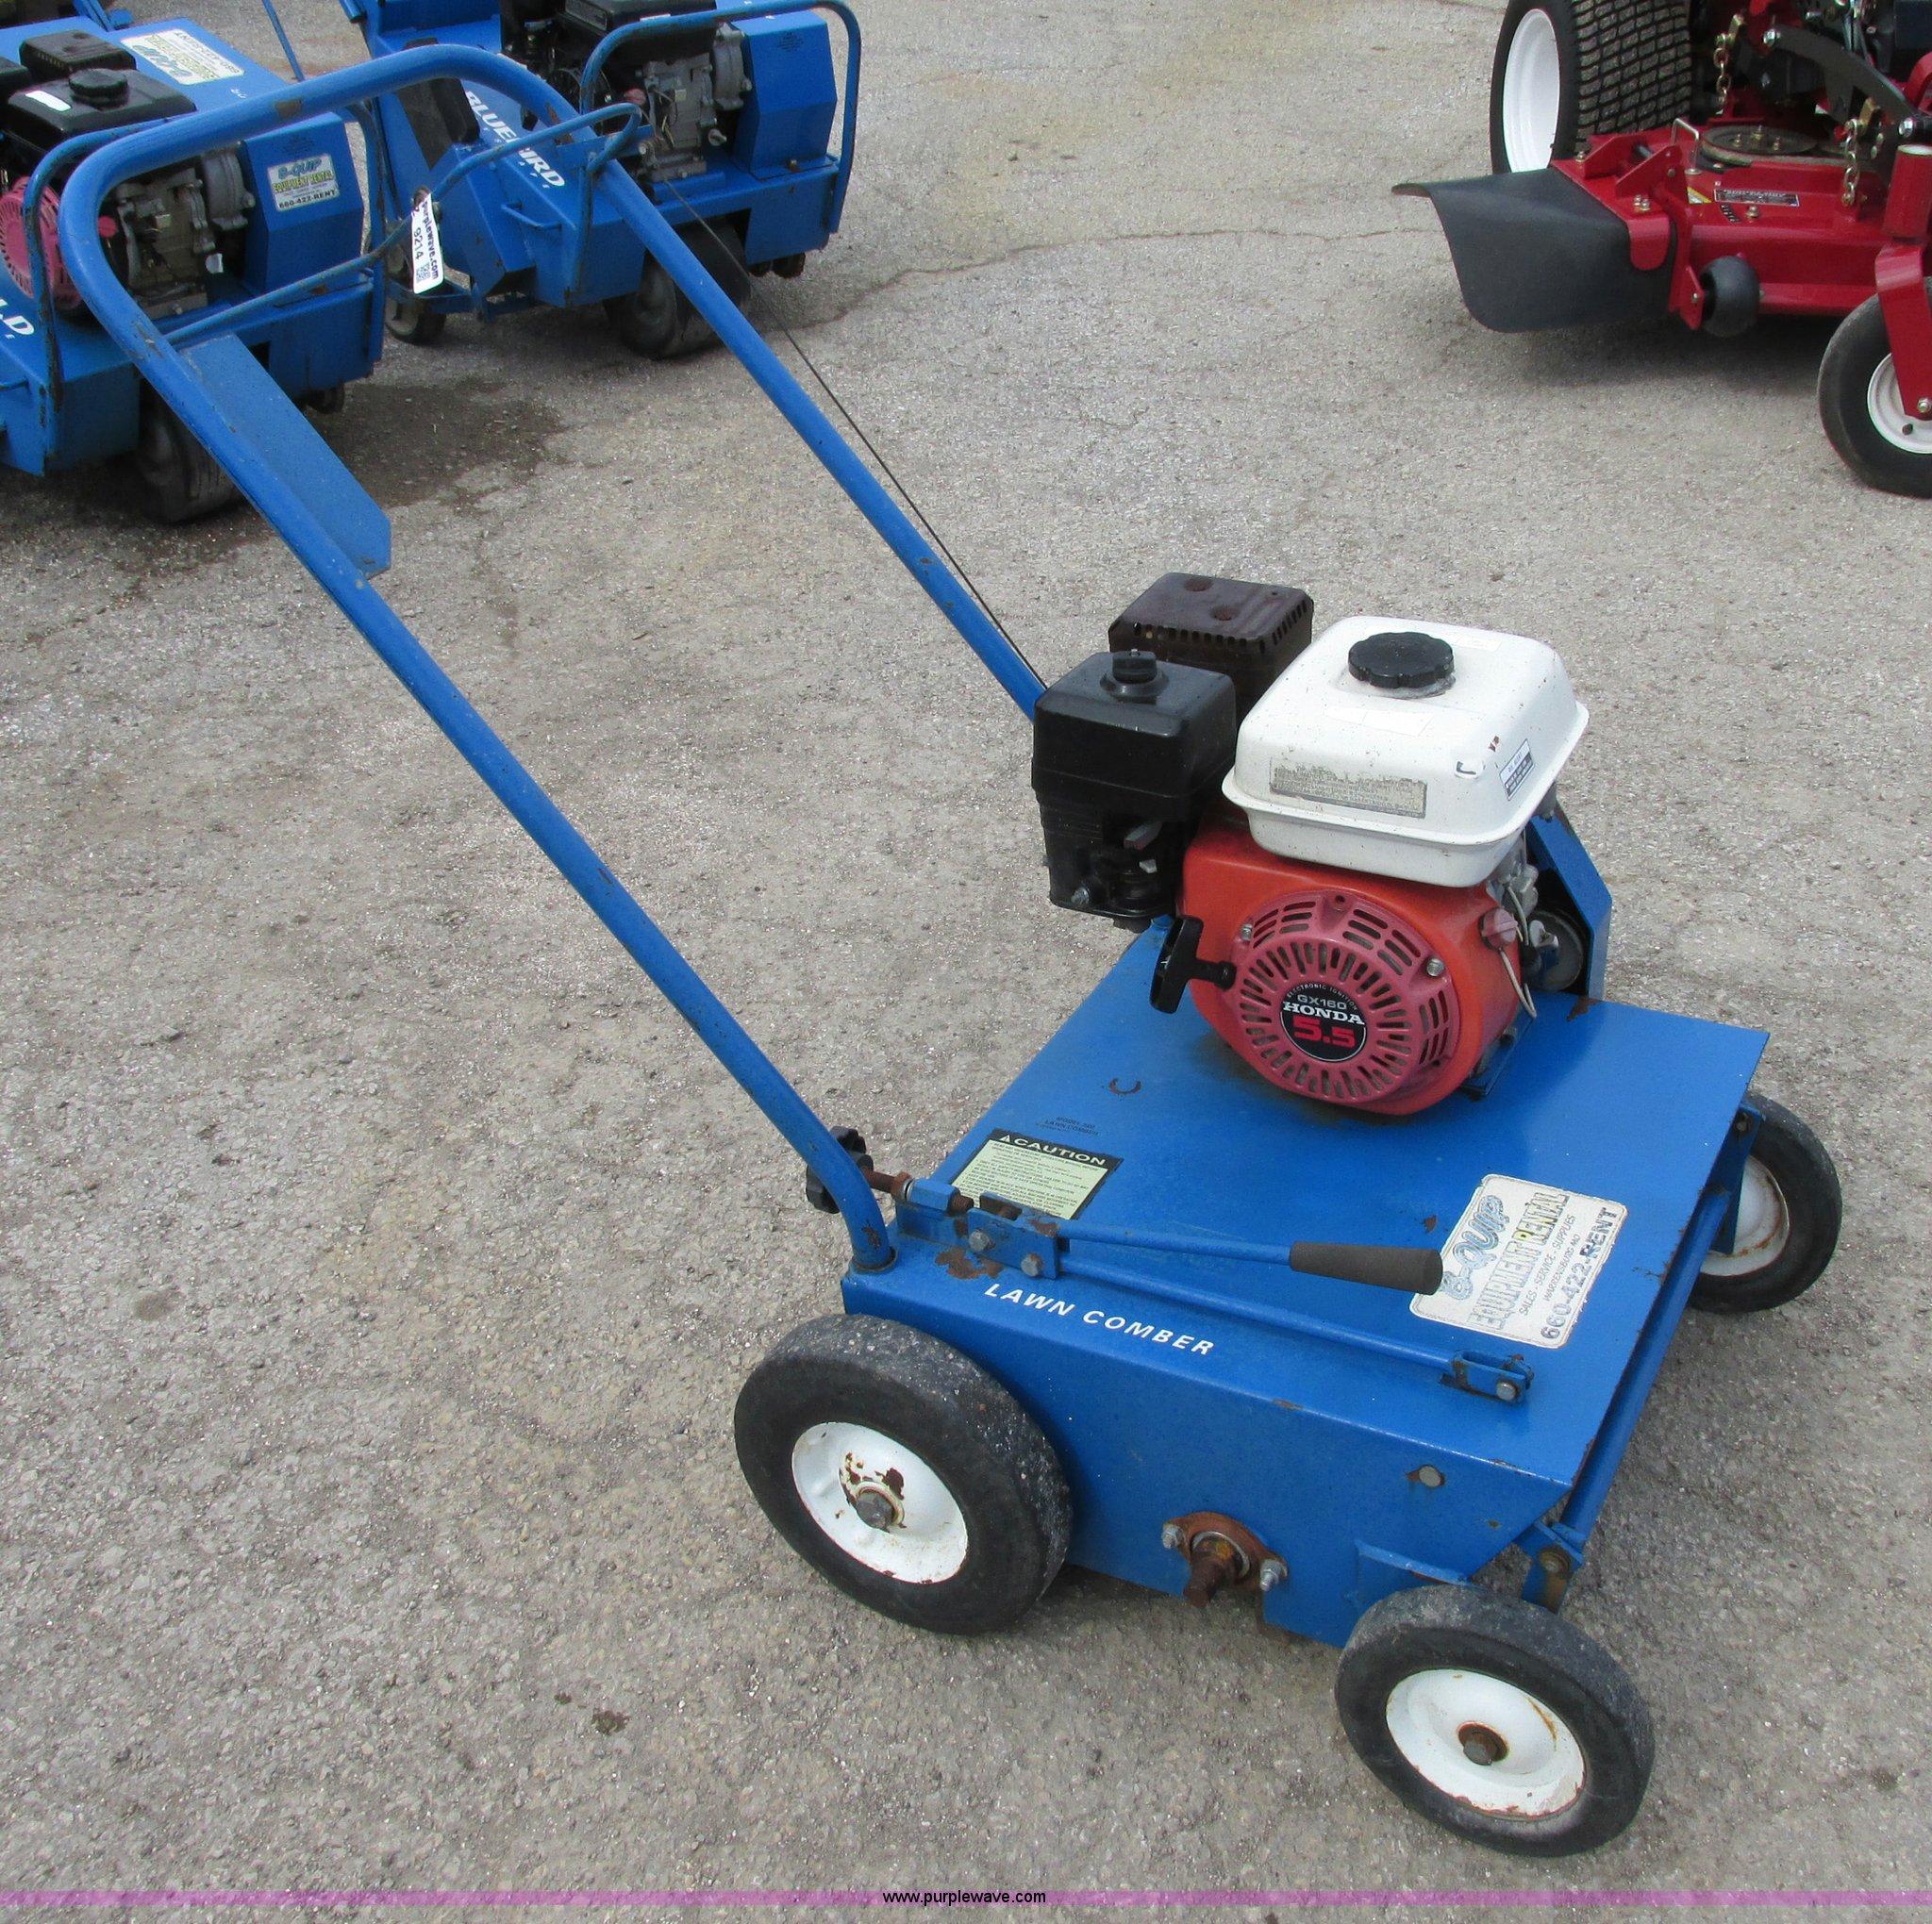 Power Rake For Sale >> Blue Bird 520 Lawn Comber Dethatcher Power Rake Item Z9214